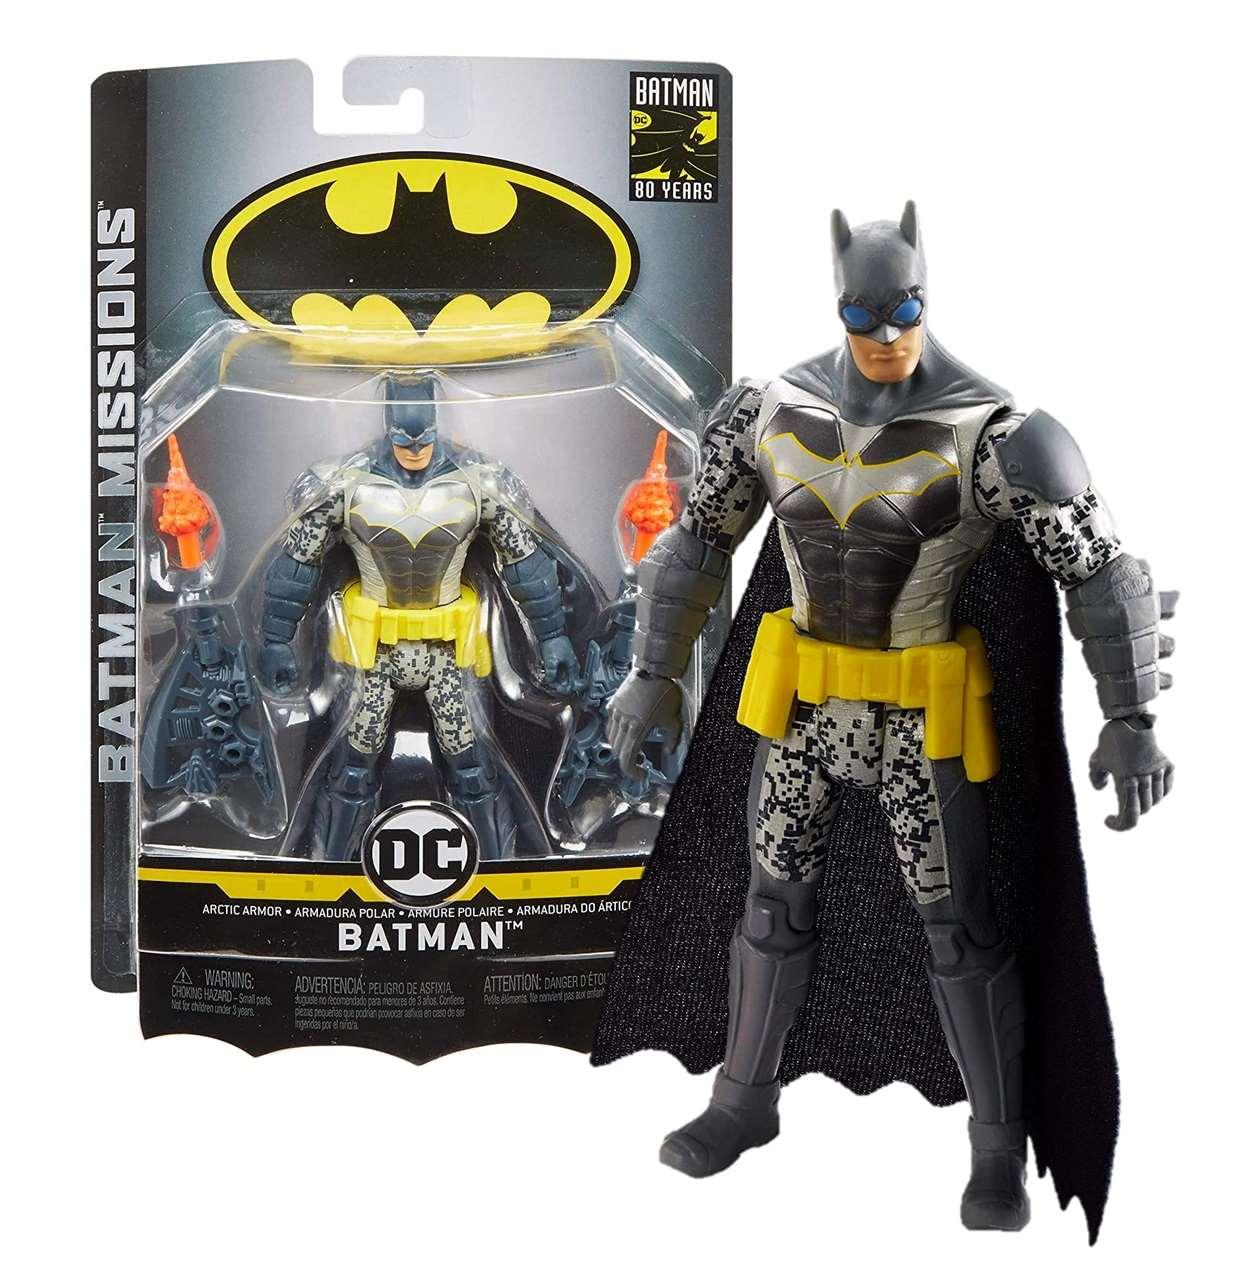 Batman Armadura Polar Figura Batman Missions 4 Pulgadas